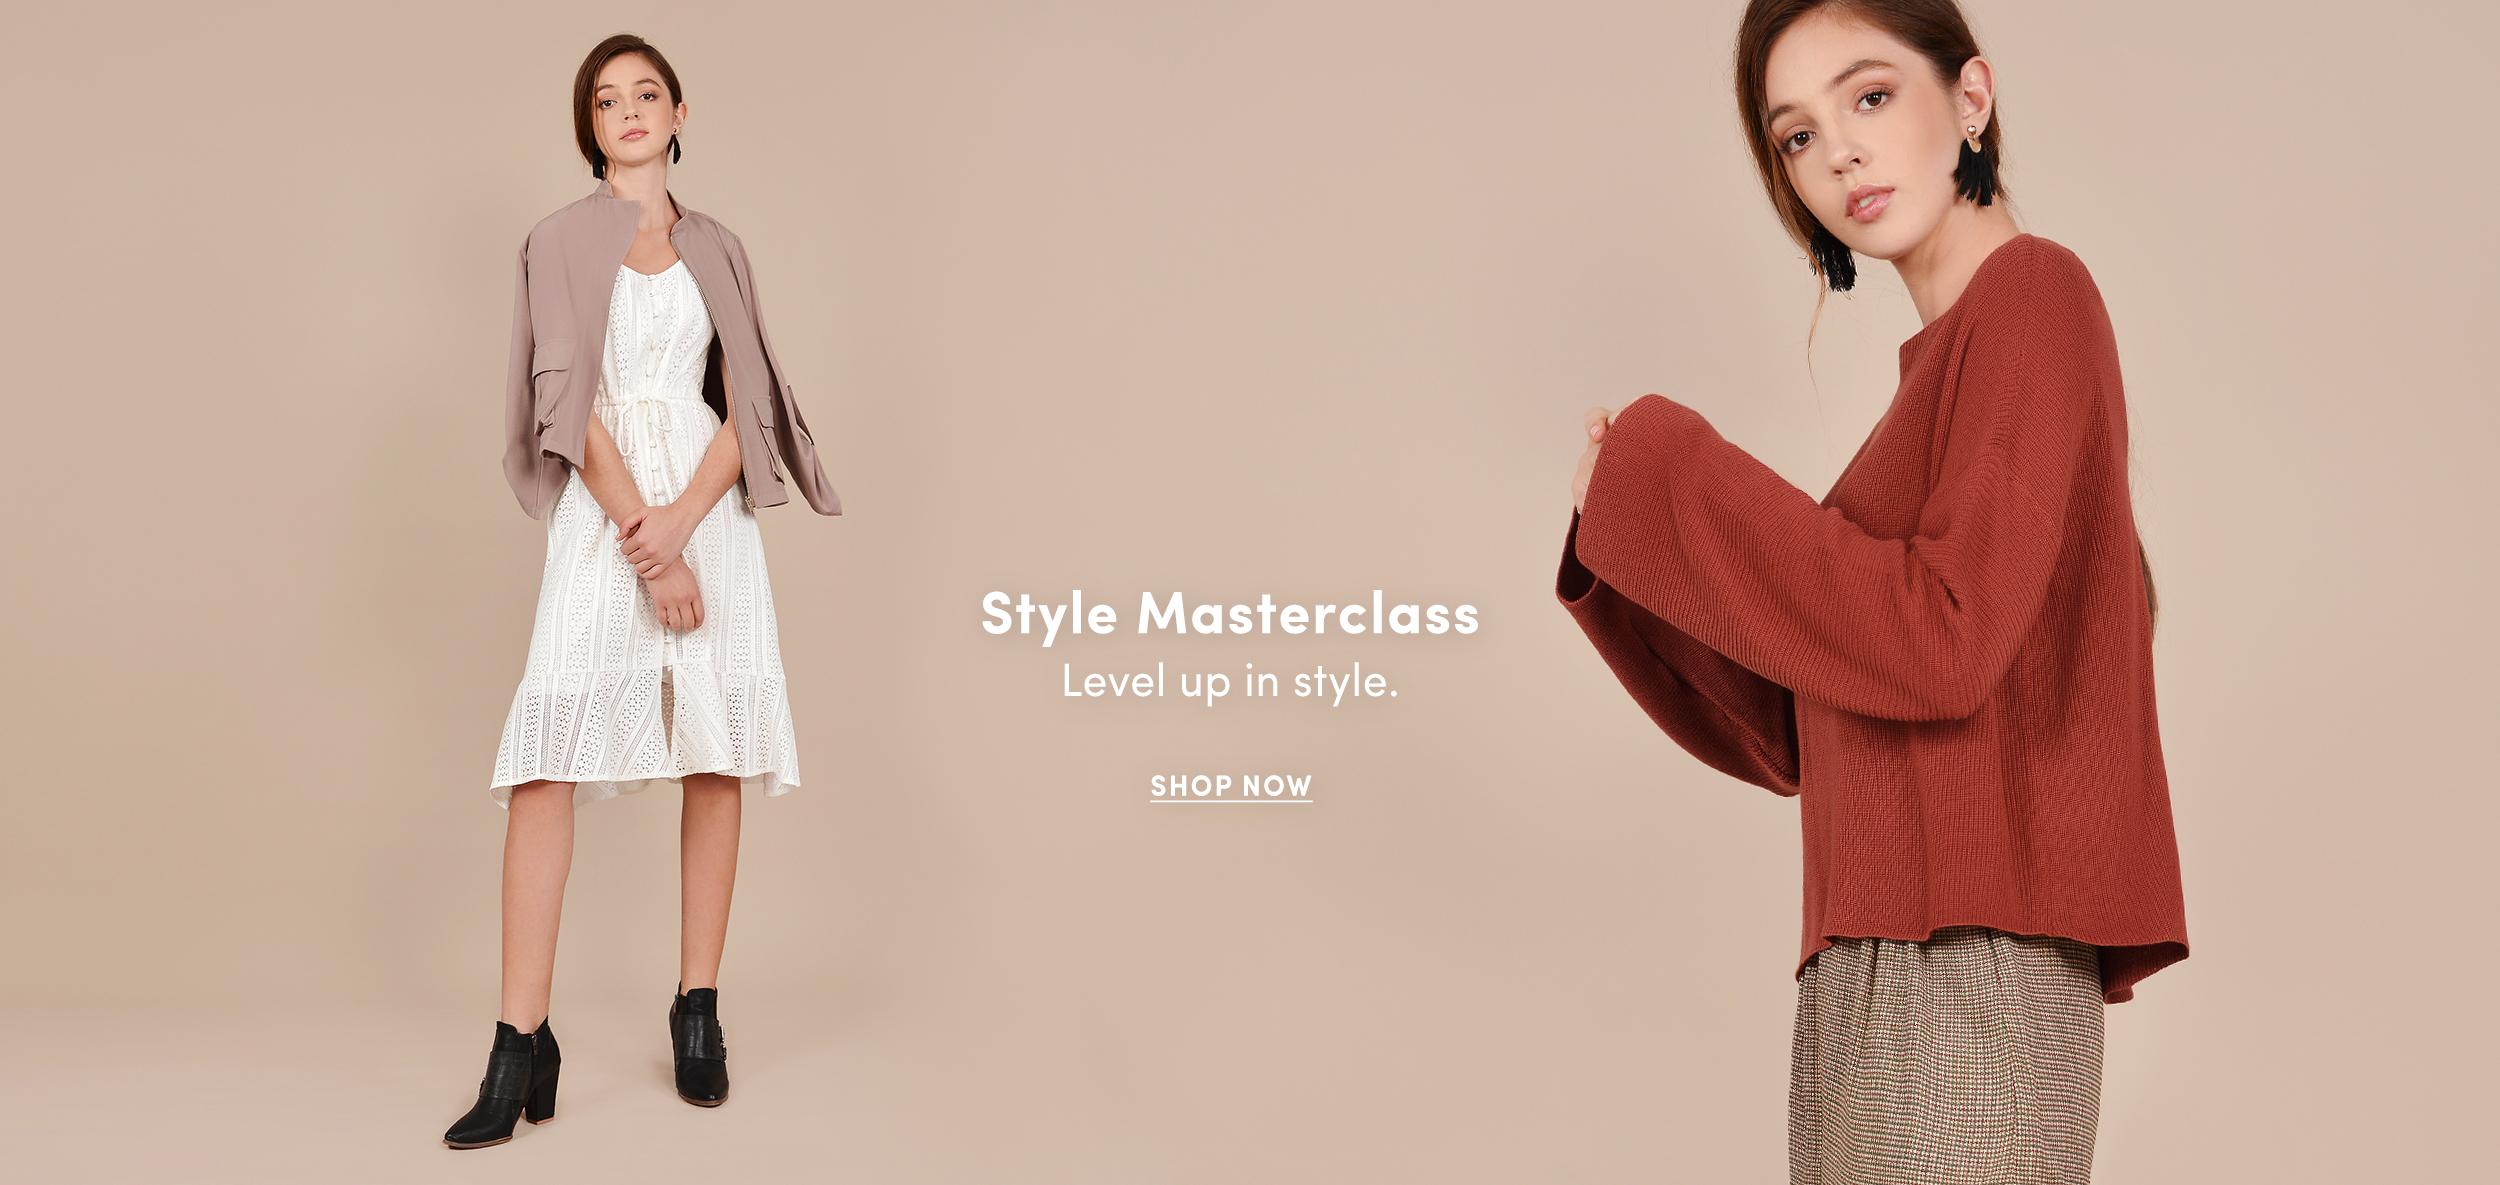 Style Masterclass